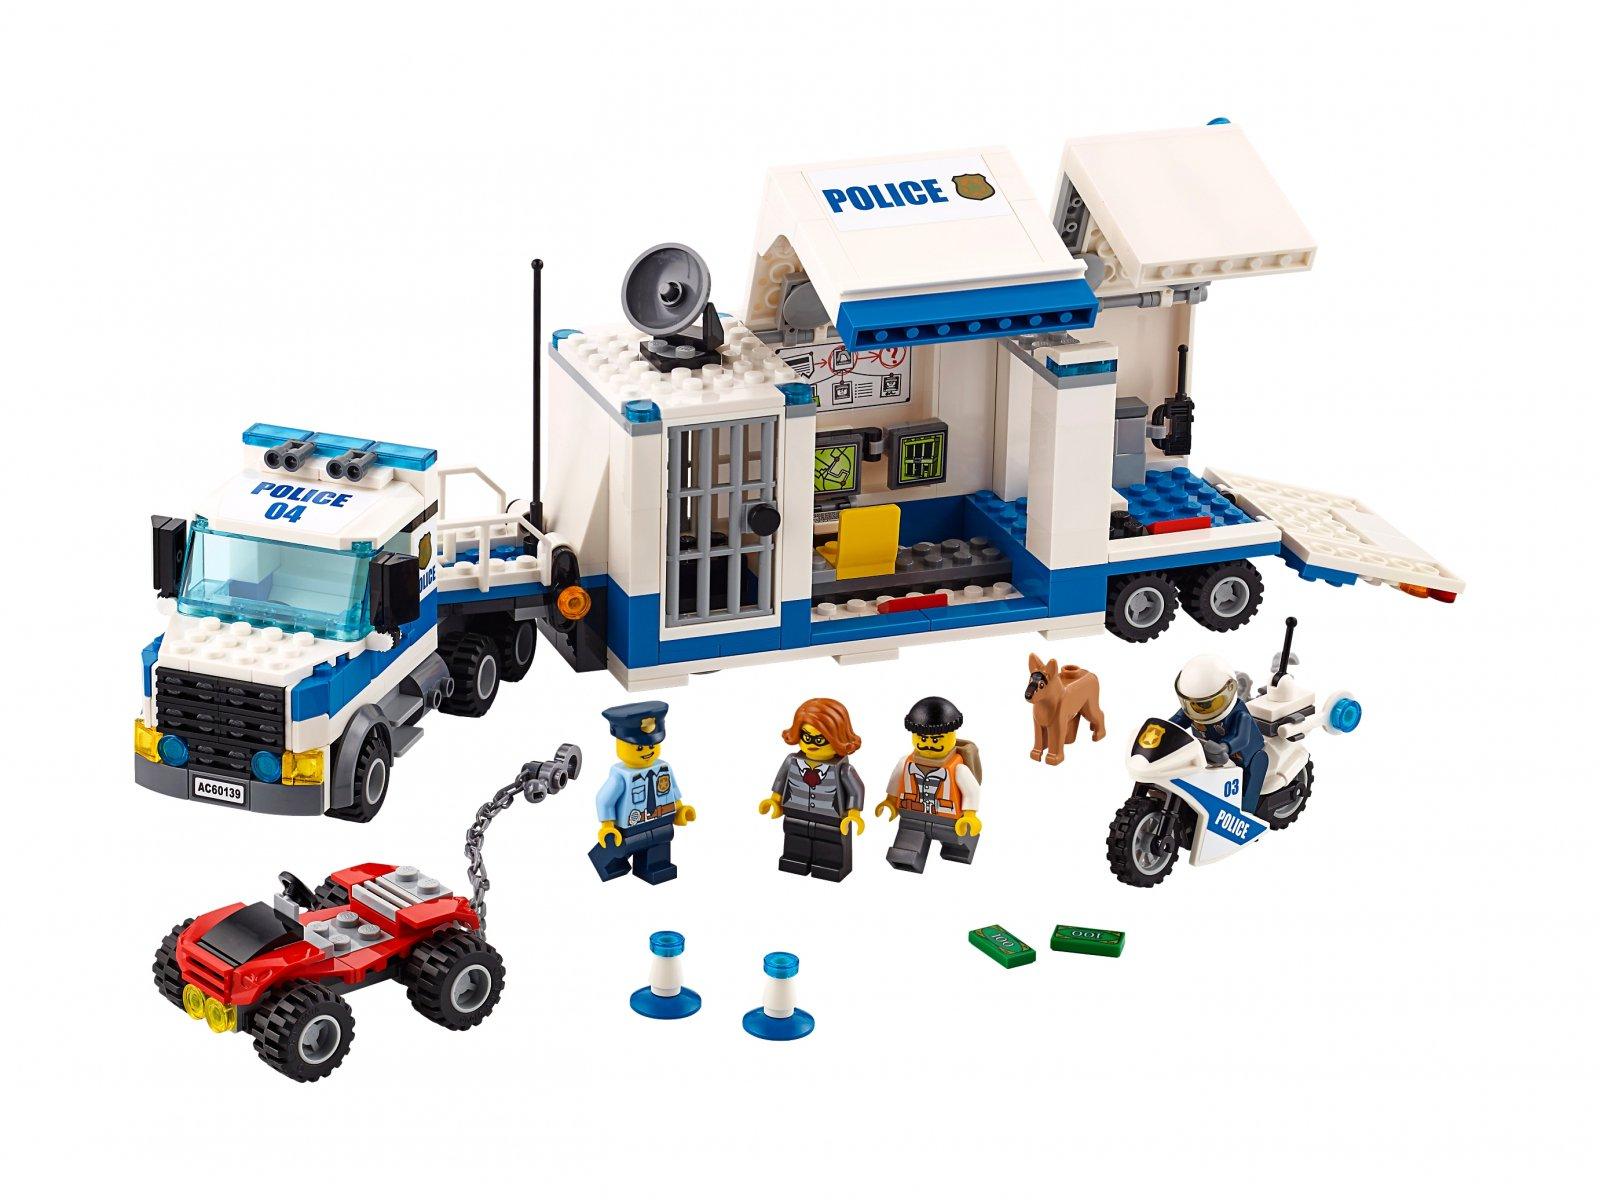 LEGO City 60139 Mobilne centrum dowodzenia